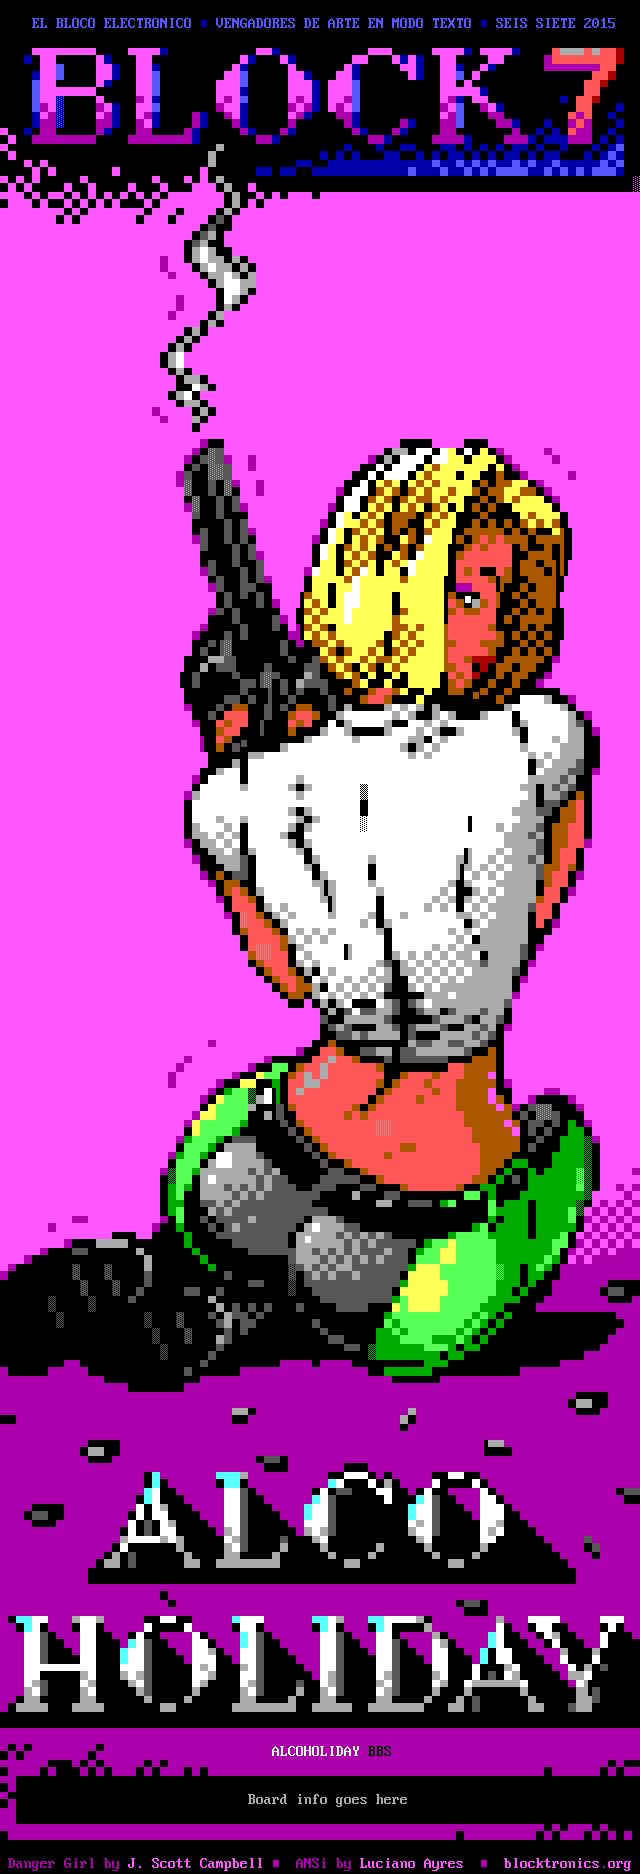 Danger Girl Comic Rip for Alcoholiday BBS